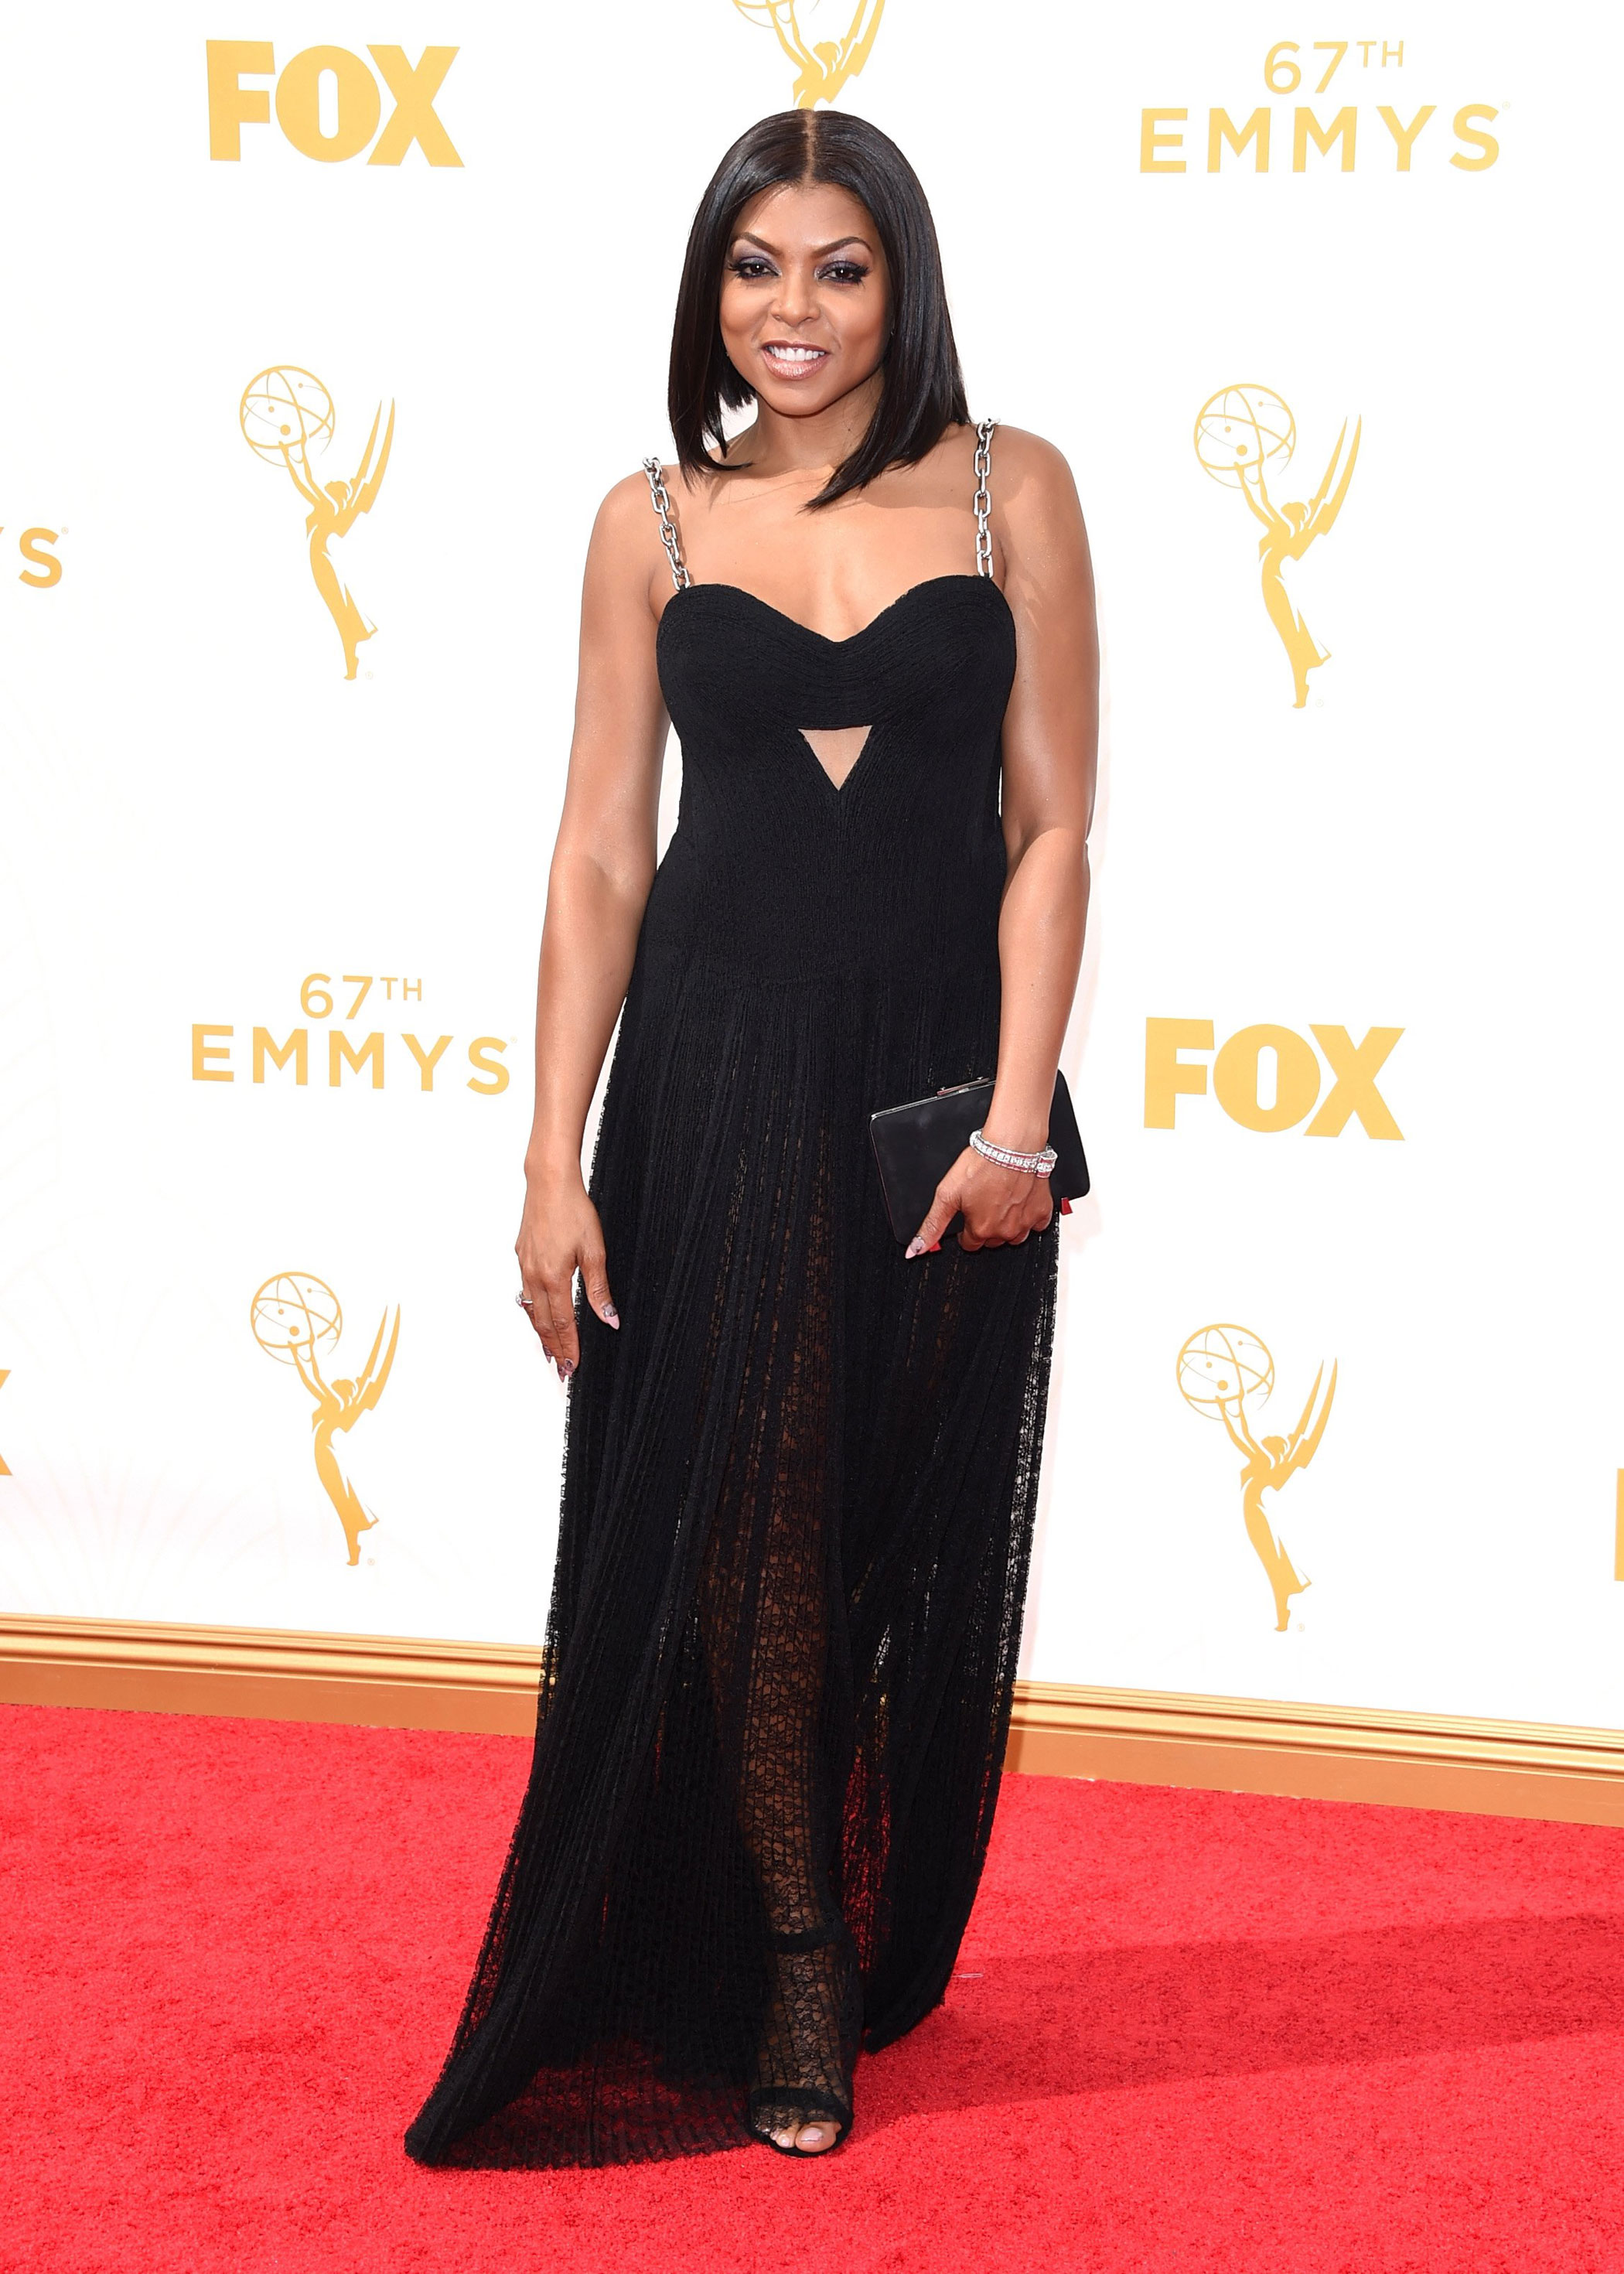 Taraji P. Henson at the 67th Emmy Award on Sept. 20, 2015 in Los Angeles.